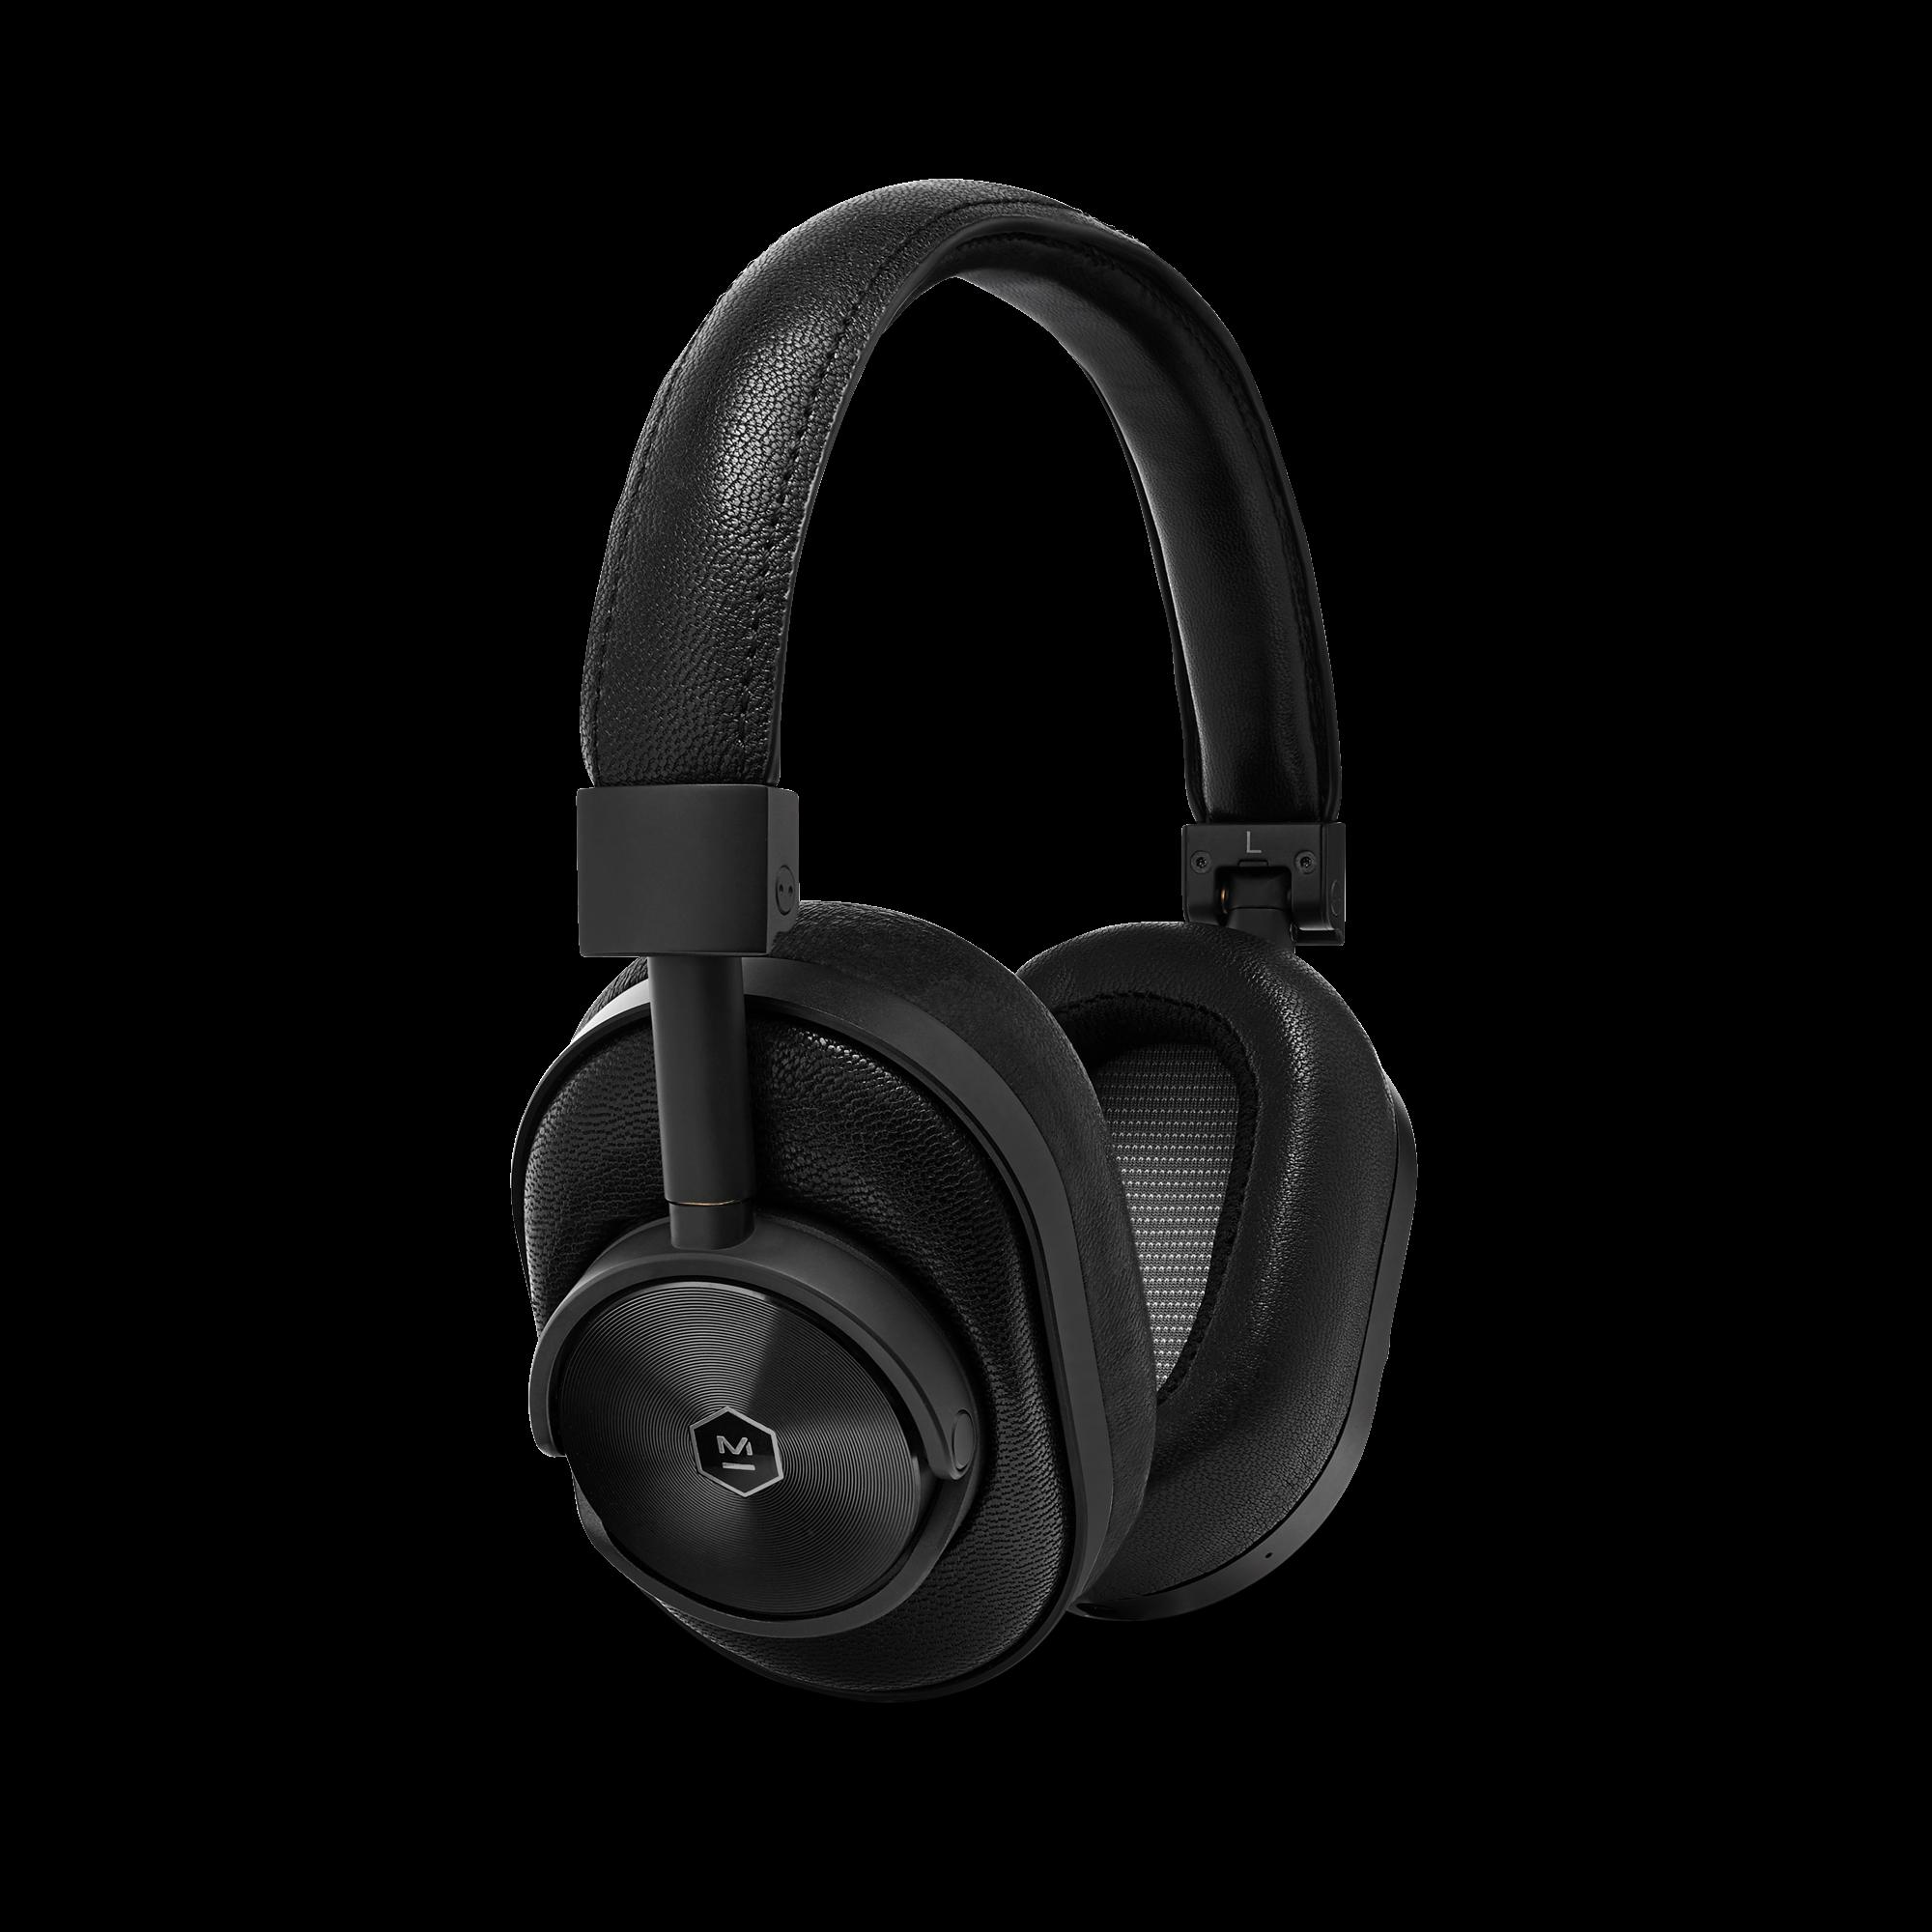 mw60-wireless-over-ear-headphones-black-black-1